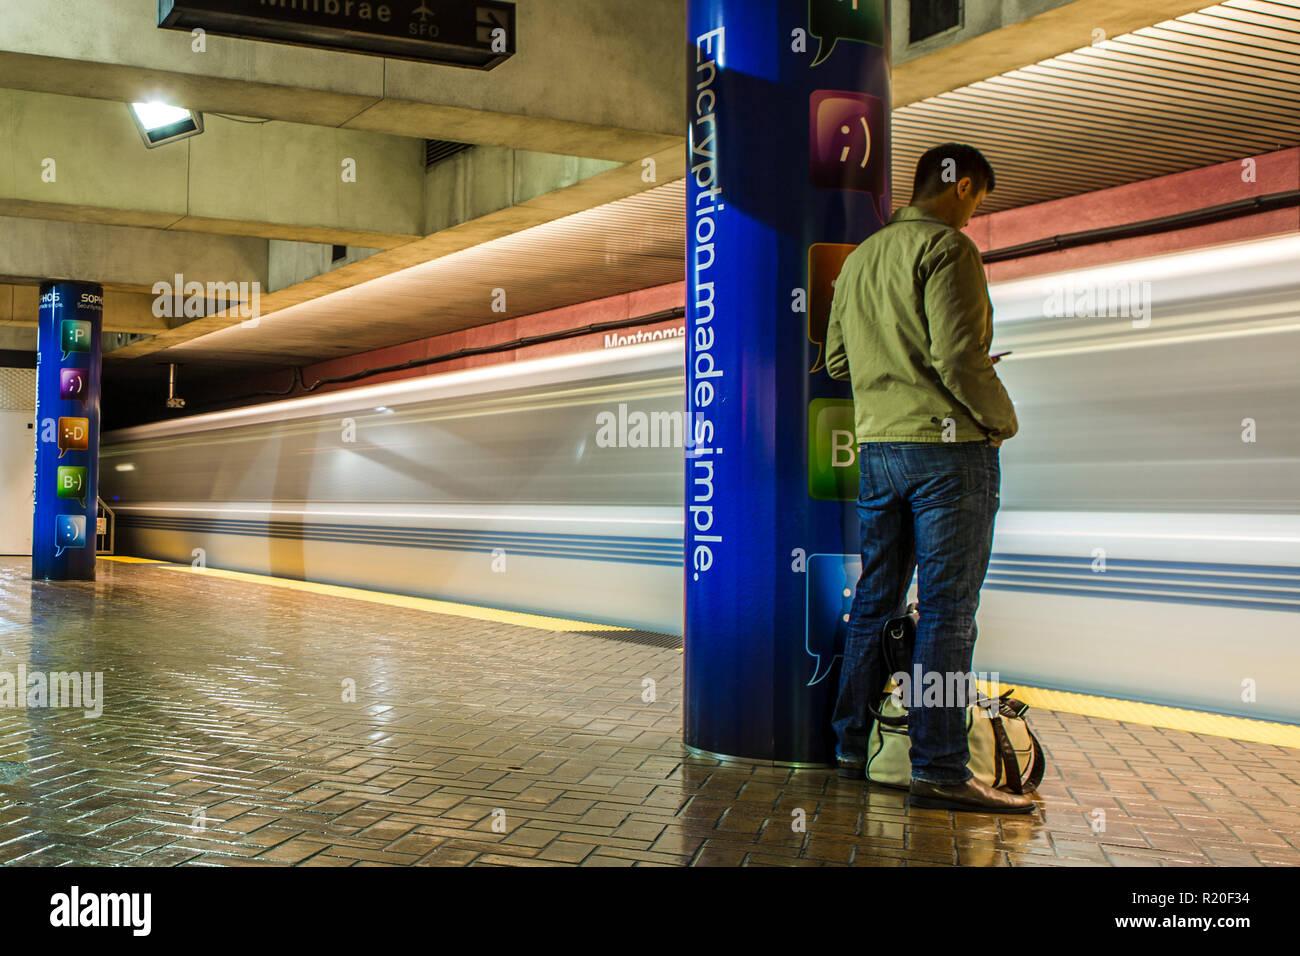 San Francisco, CA / USA - 5/1/2015: Man Waiting For Bart Alone - Stock Image